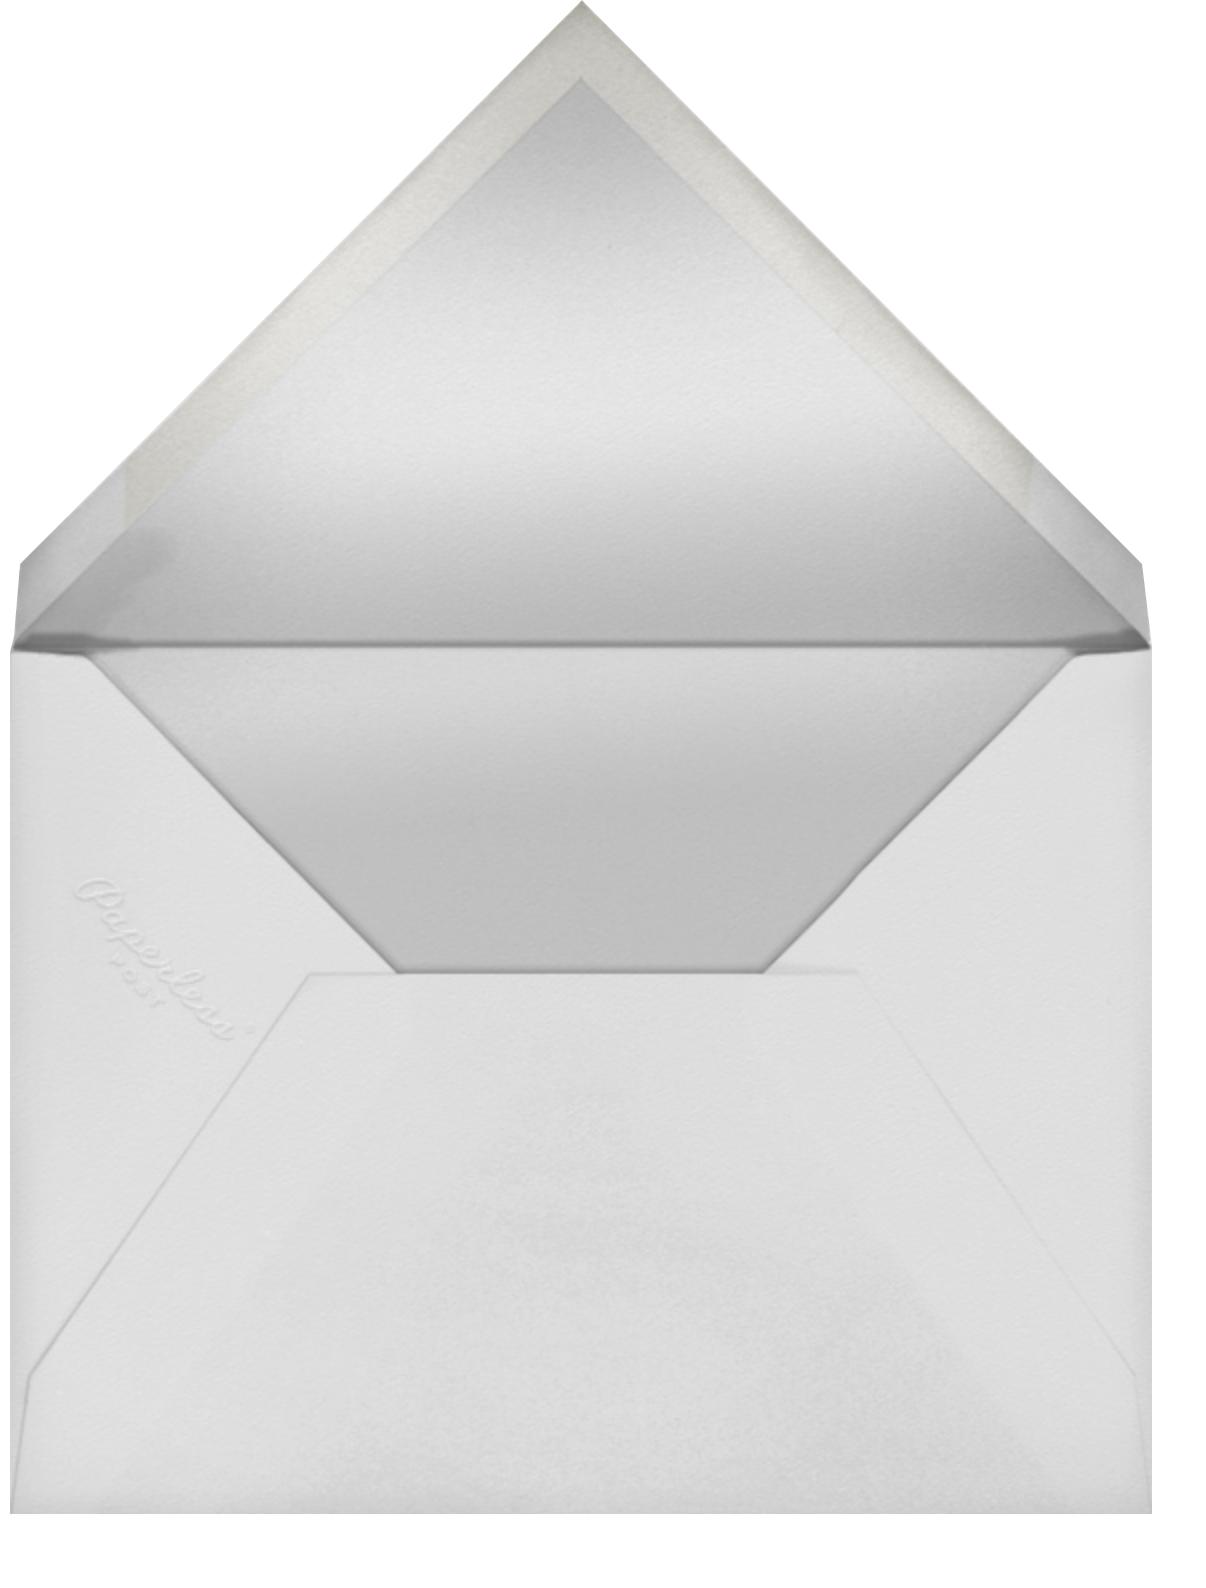 Orangerie (Square) - White - Rifle Paper Co. - Bridal shower - envelope back